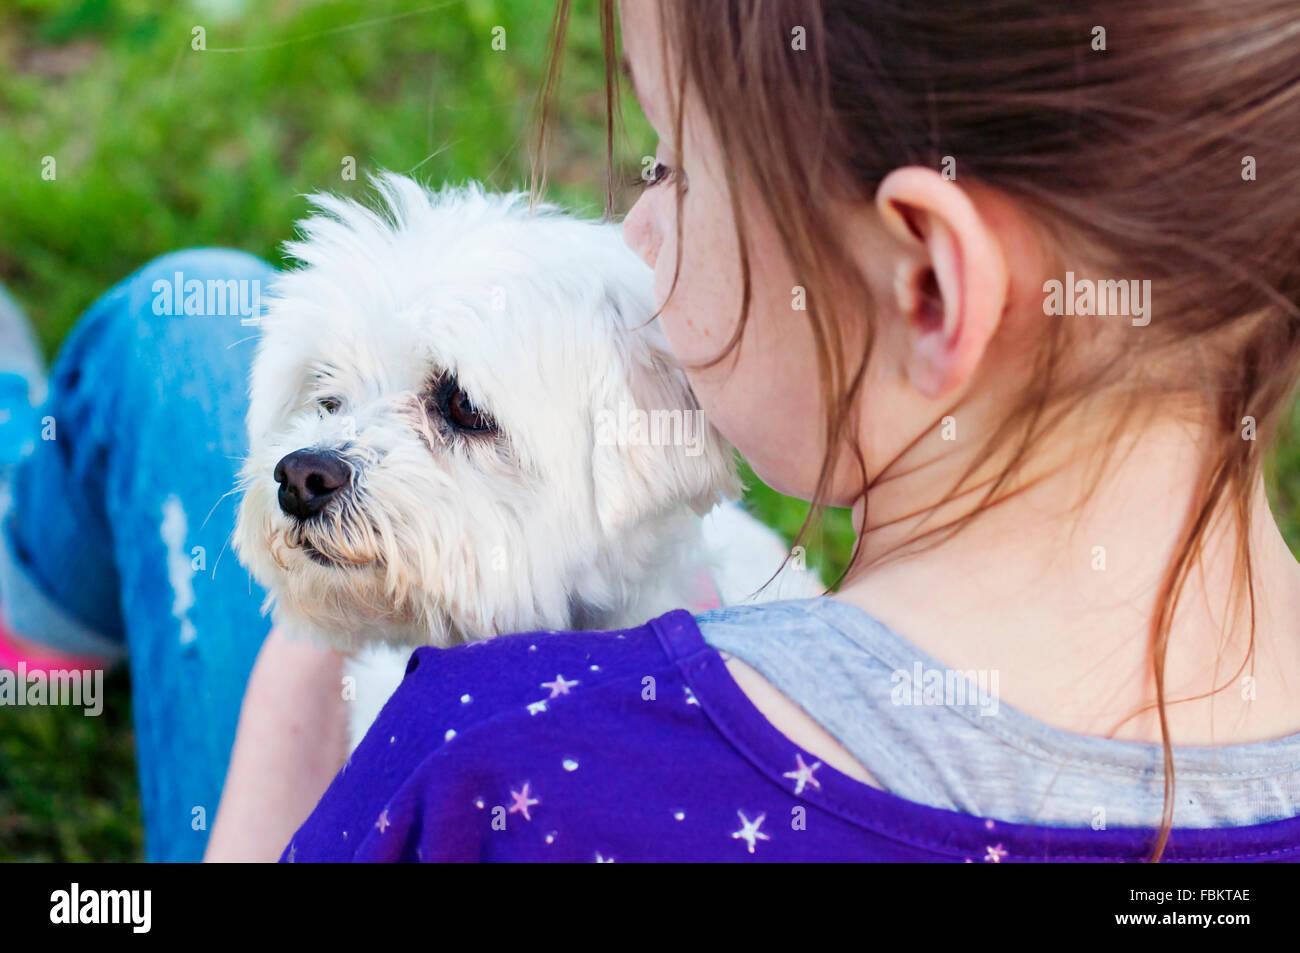 Chica sujetando perro Imagen De Stock